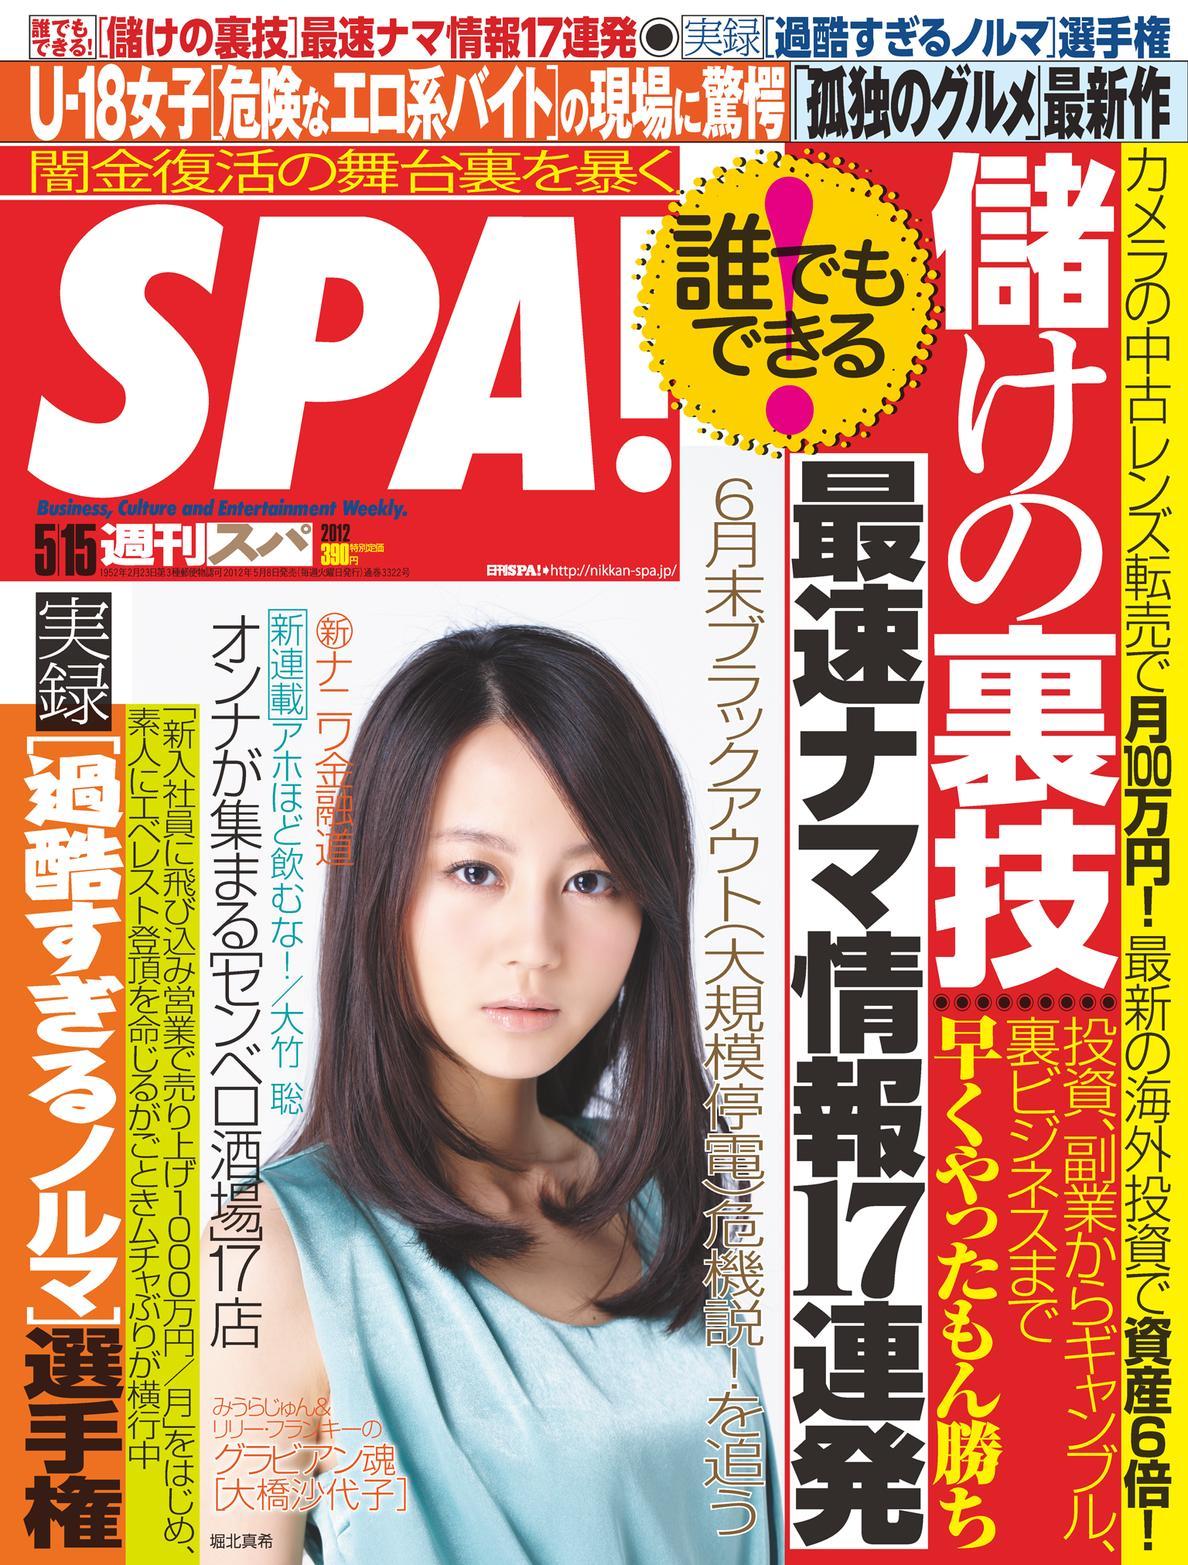 SPA! 2012年5月15日号   マガストア